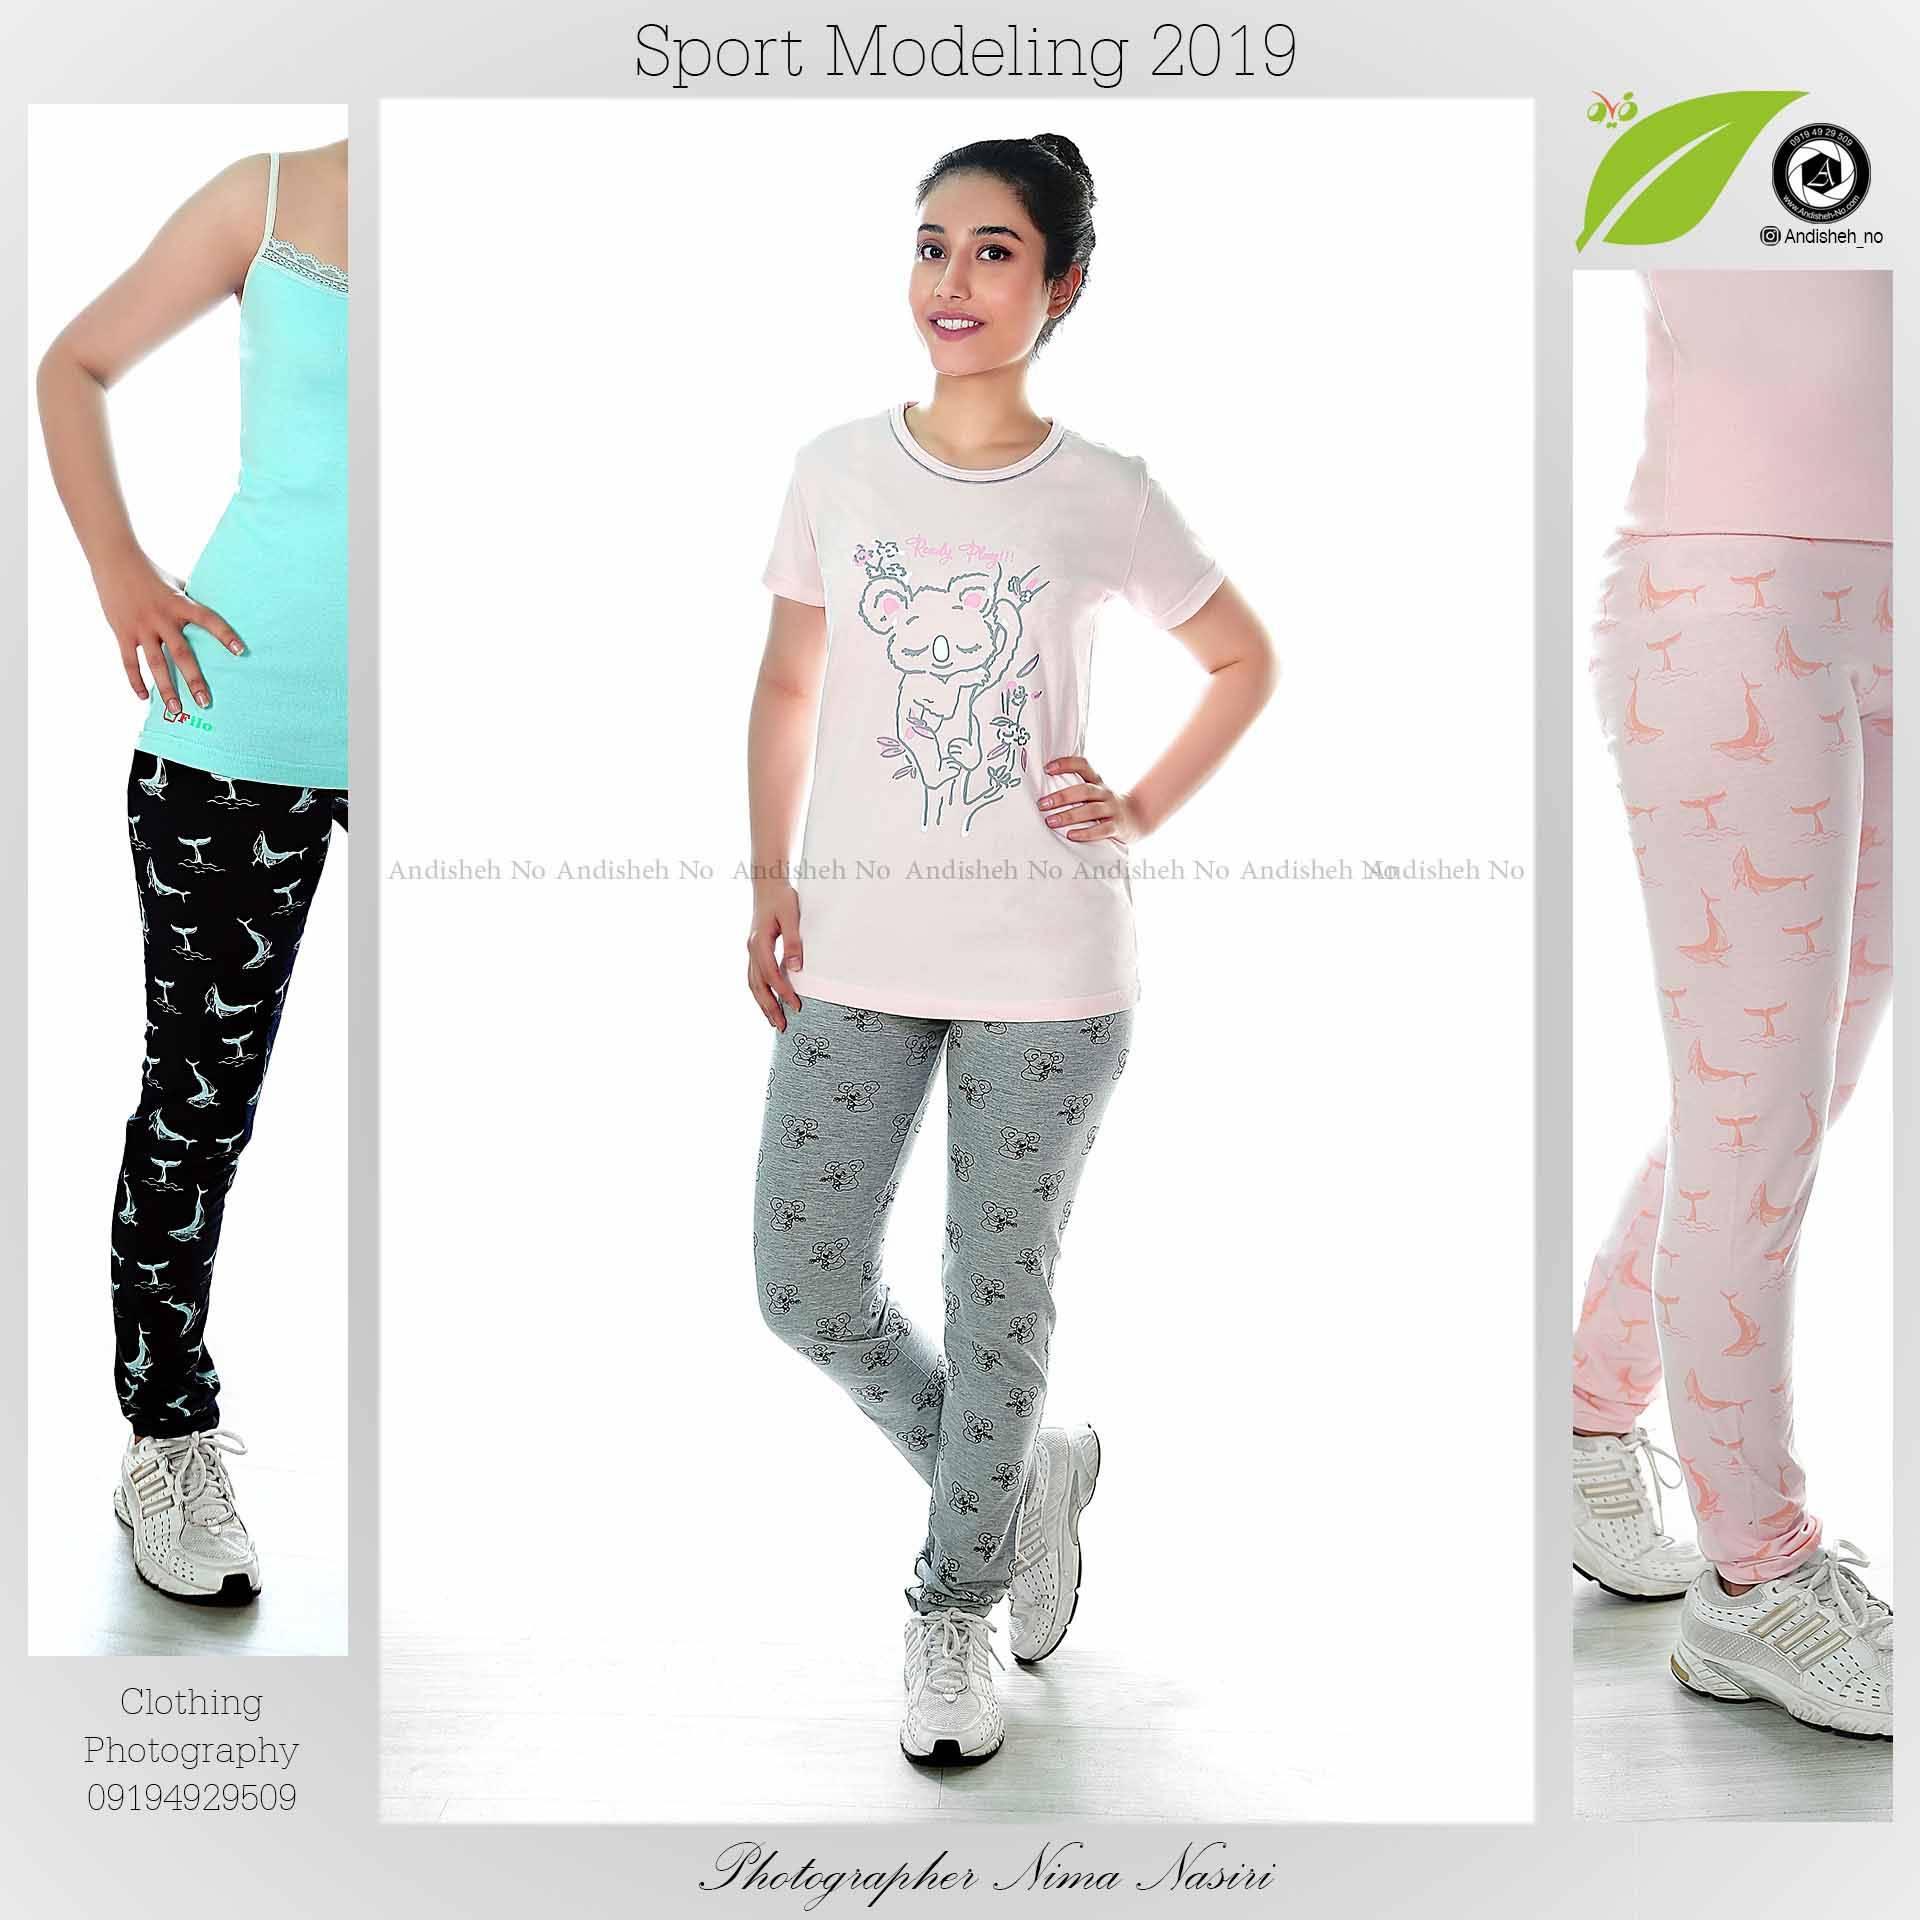 Clothing-filobaft-Photography-andisheh-no- modeling 2019 fashion persian iranian